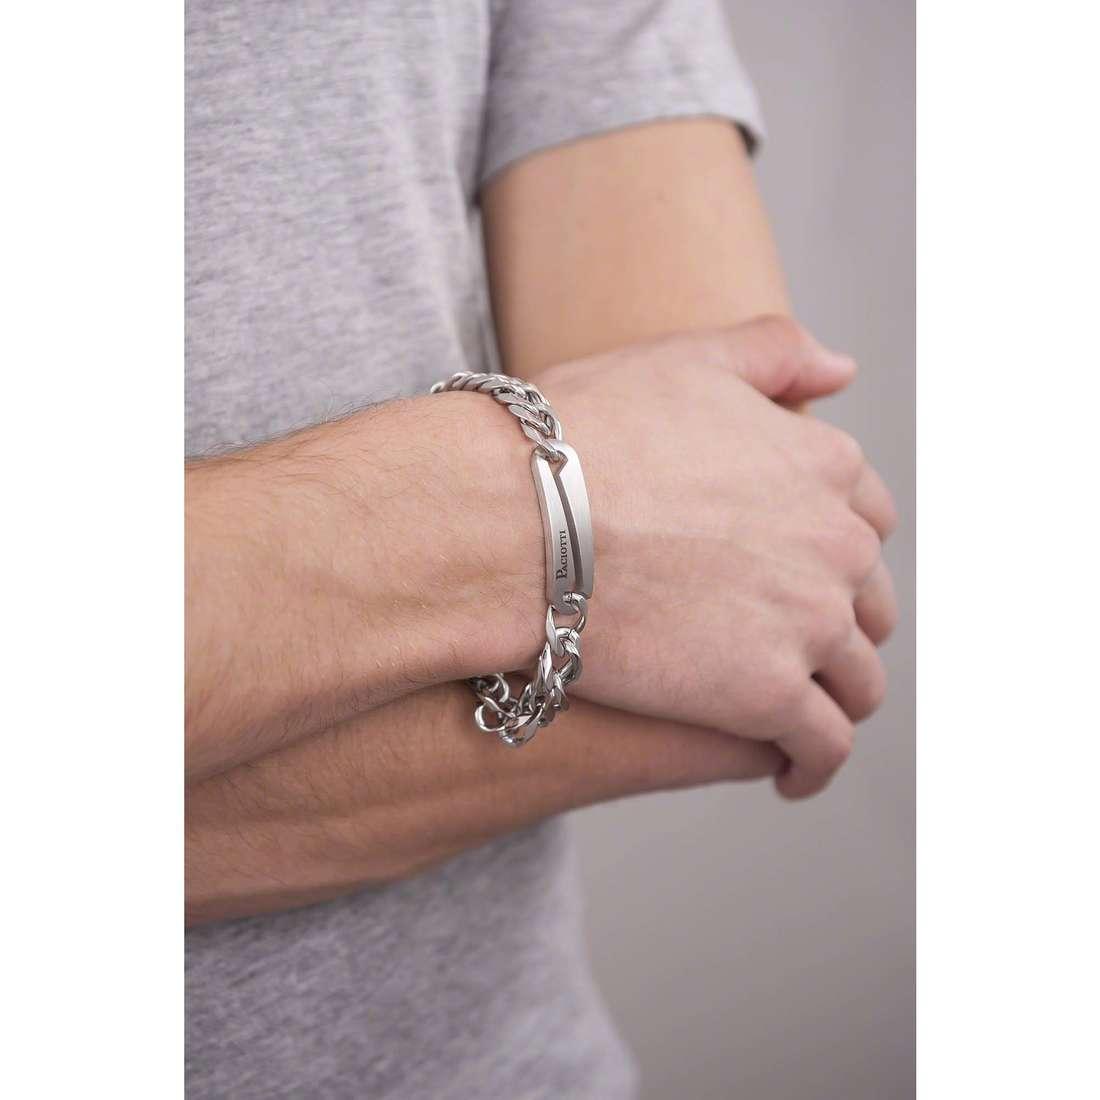 4US Cesare Paciotti bracelets Steel homme 4UBR1314 indosso